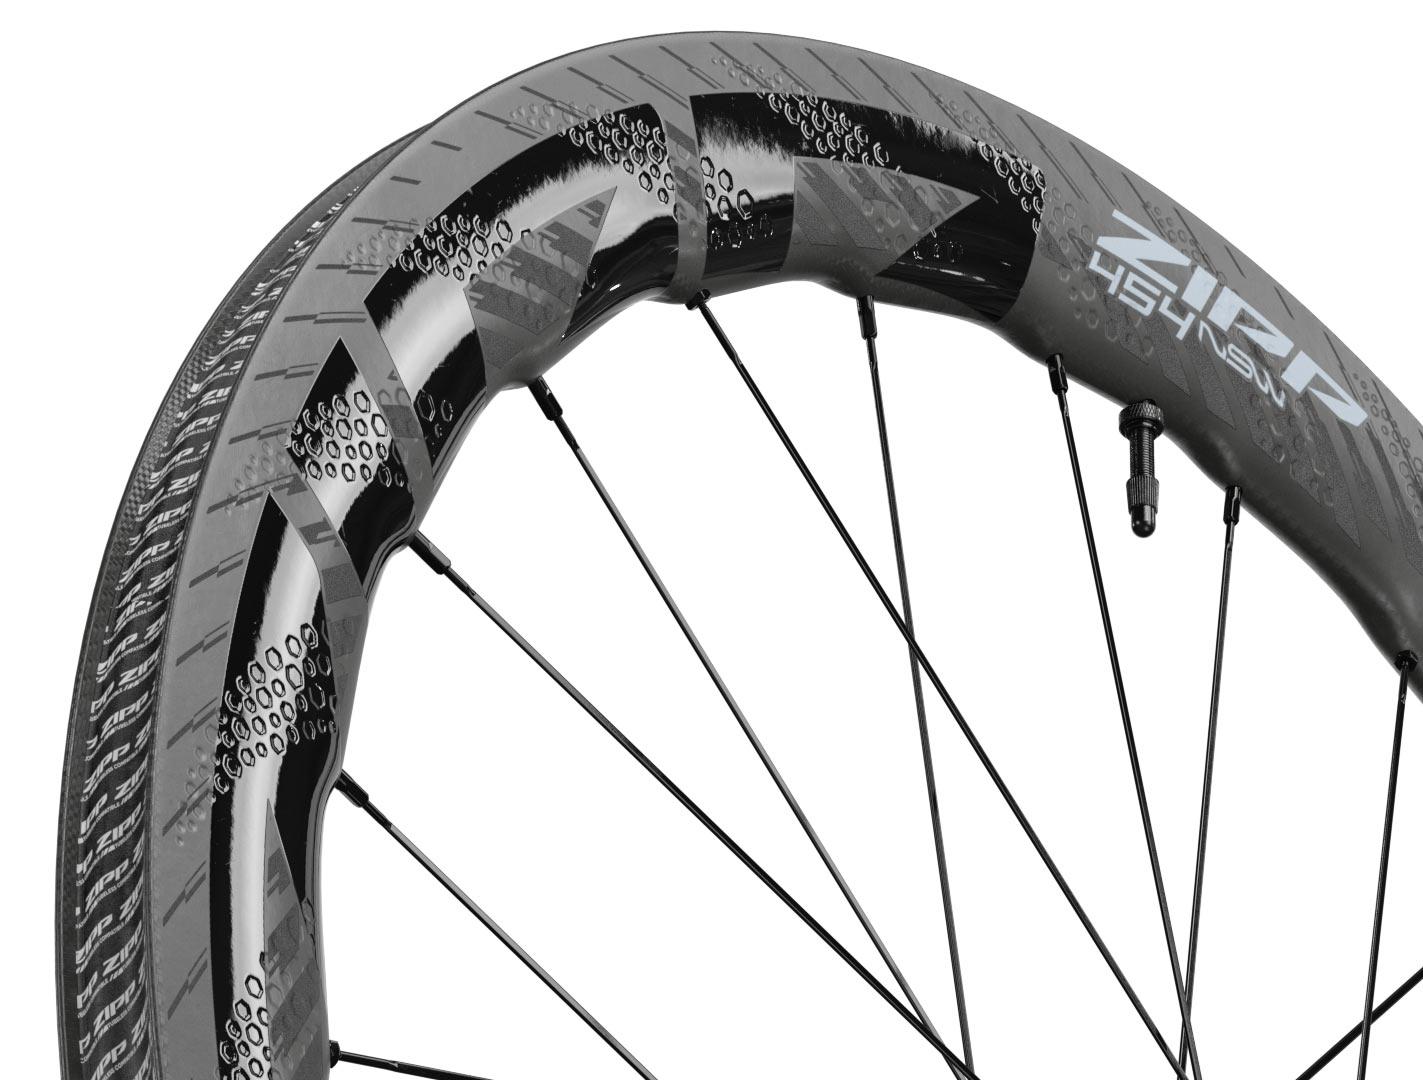 2022 zipp 454 NSW tubeless disc brake road bike wheels closeup detail of dimples